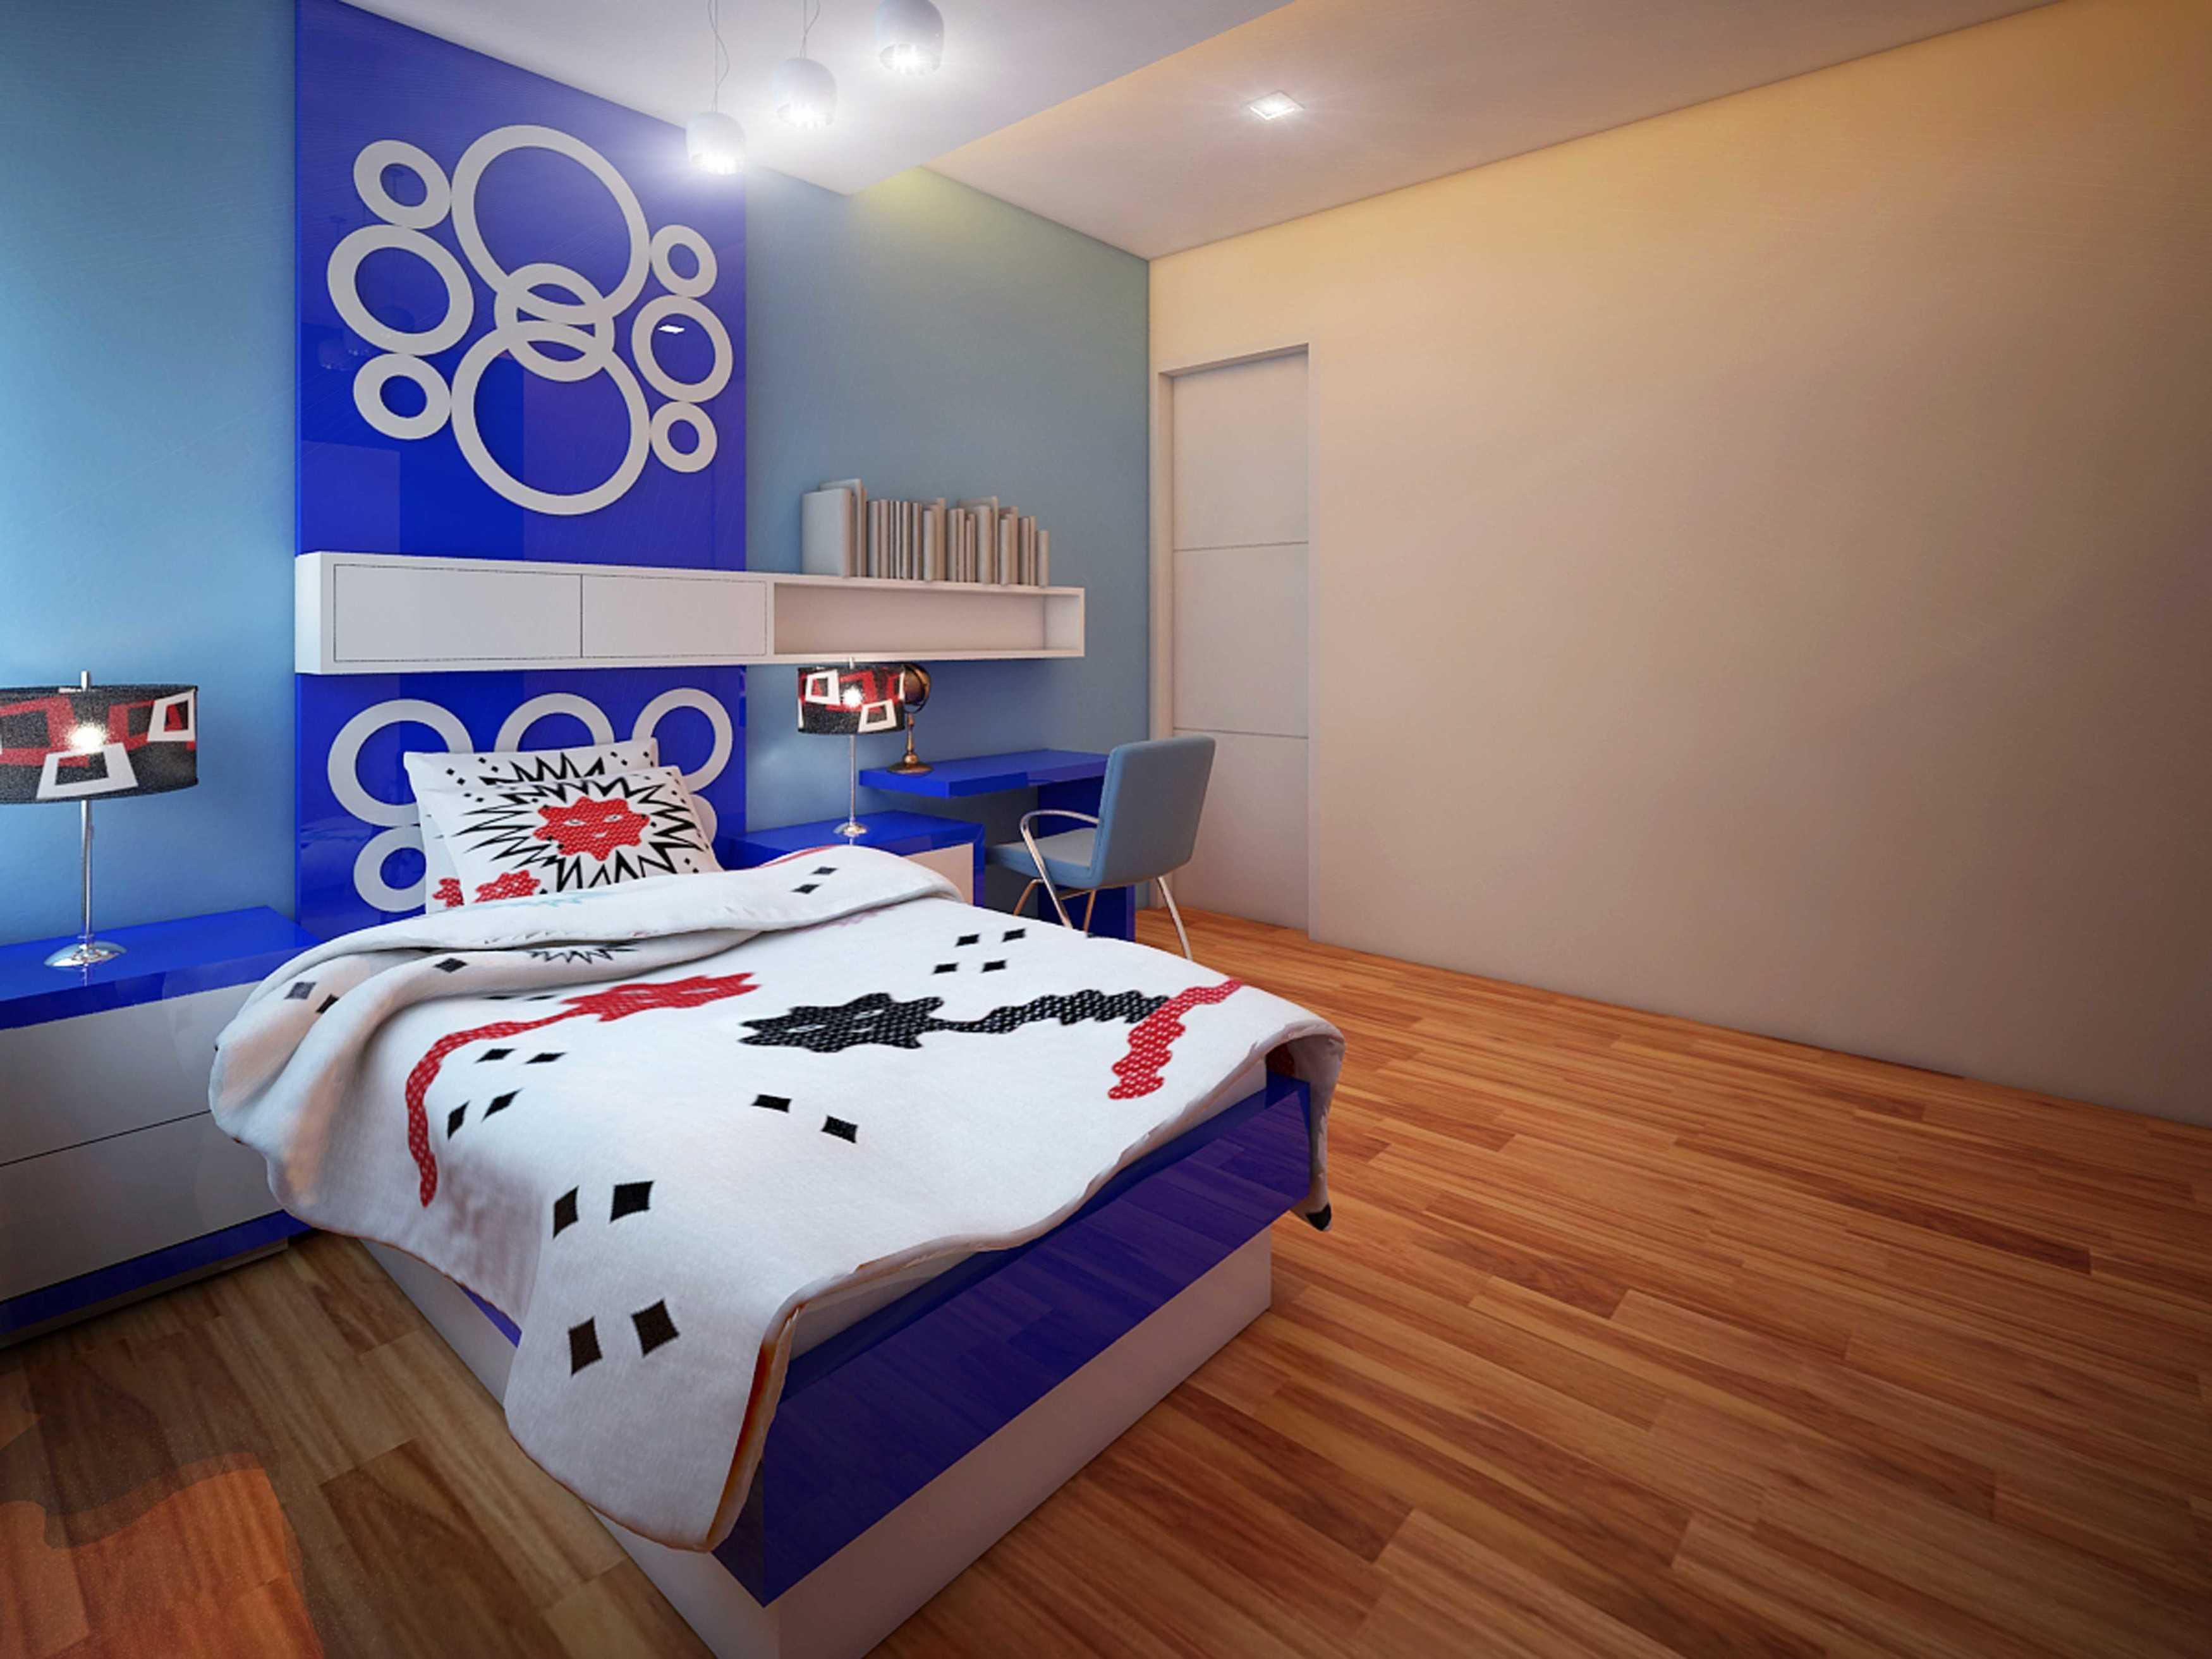 A2M Architect Indo S House Kota Makassar, Sulawesi Selatan, Indonesia Kota Makassar, Sulawesi Selatan, Indonesia Kids Bedroom   43627